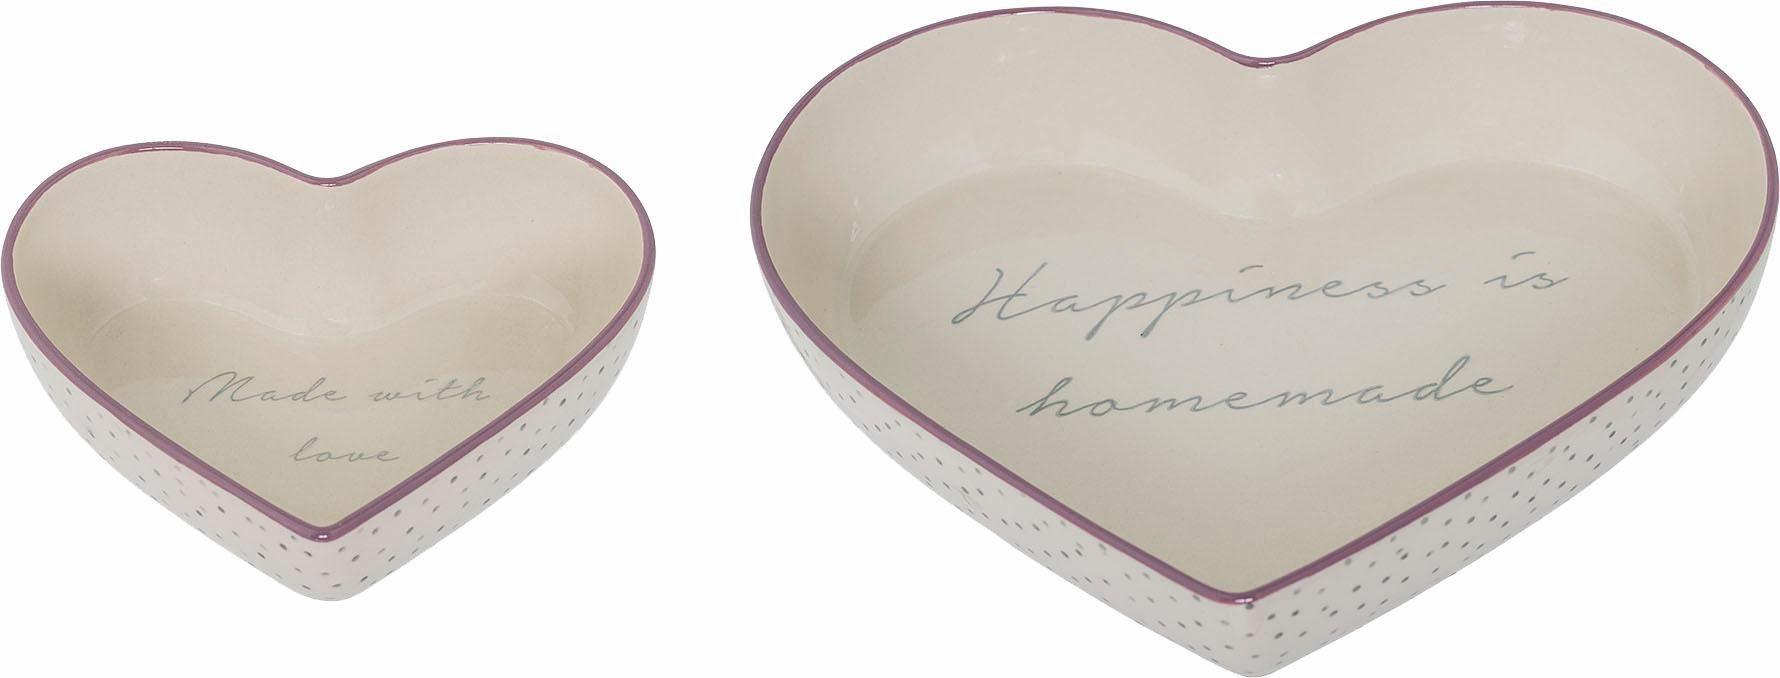 Bloomingville Kuchenform Herz (2-tlg. Set)